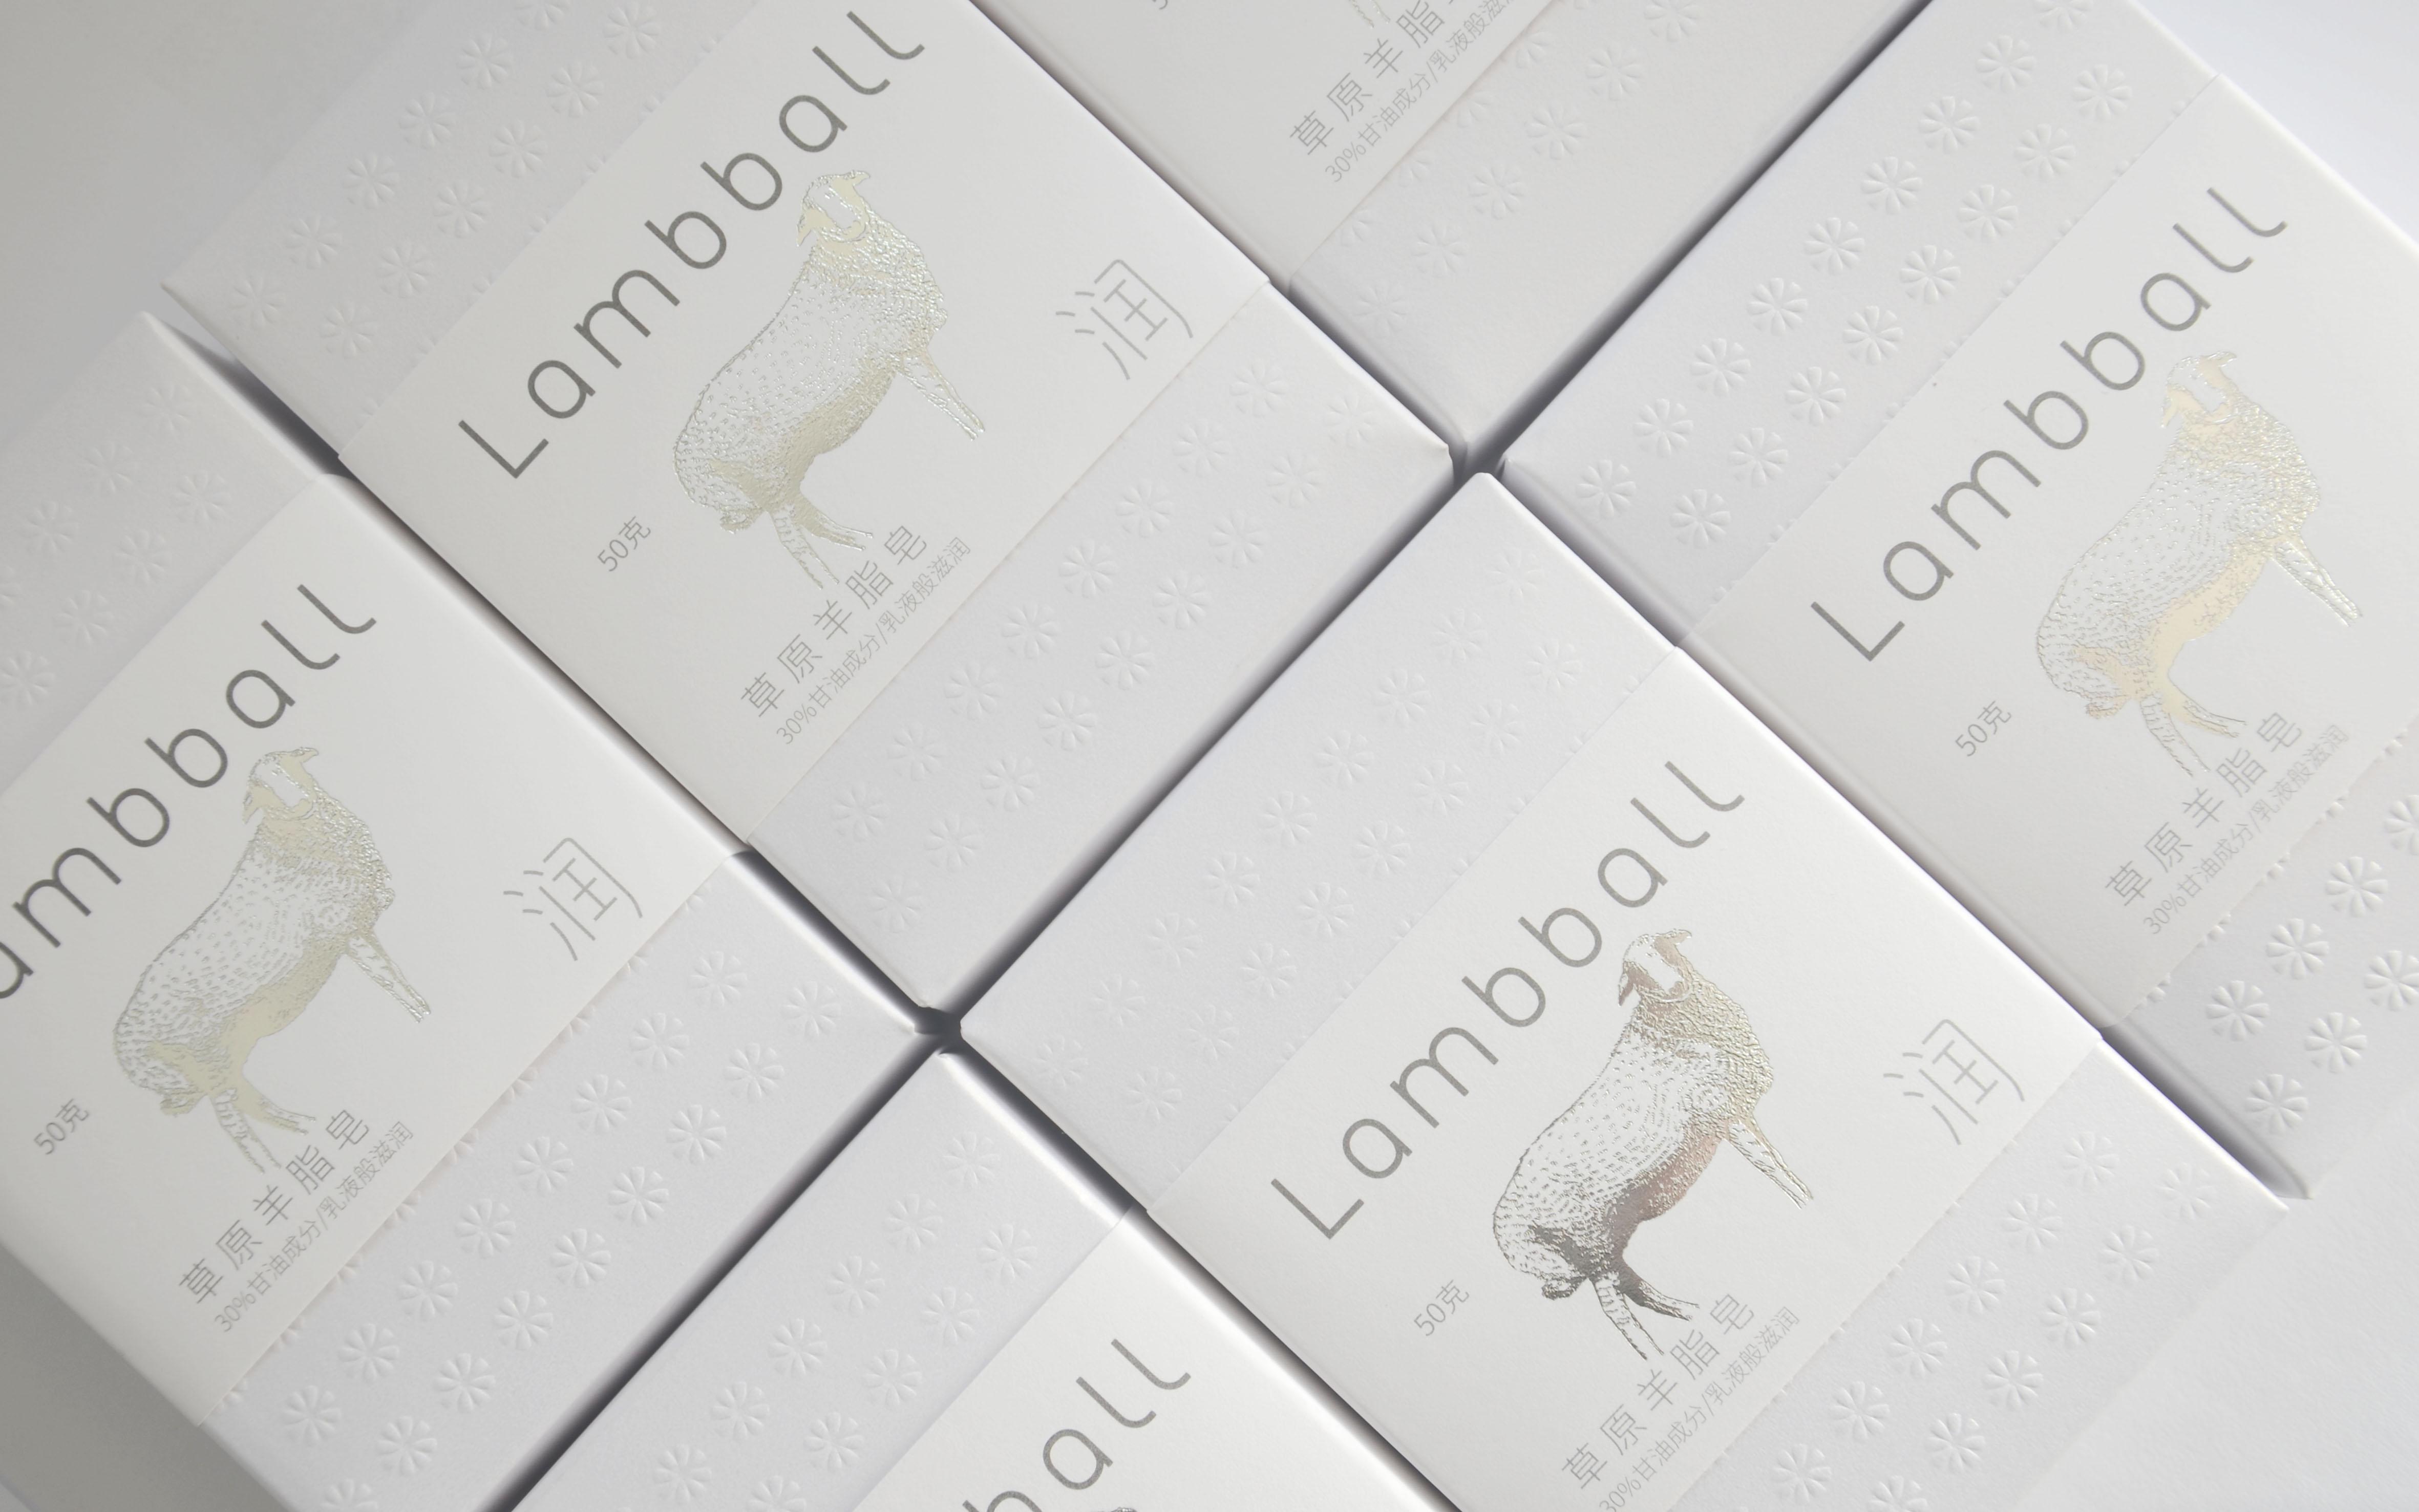 lambball羊脂皂包装设计 第3张 lambball羊脂皂包装设计 蒙古设计